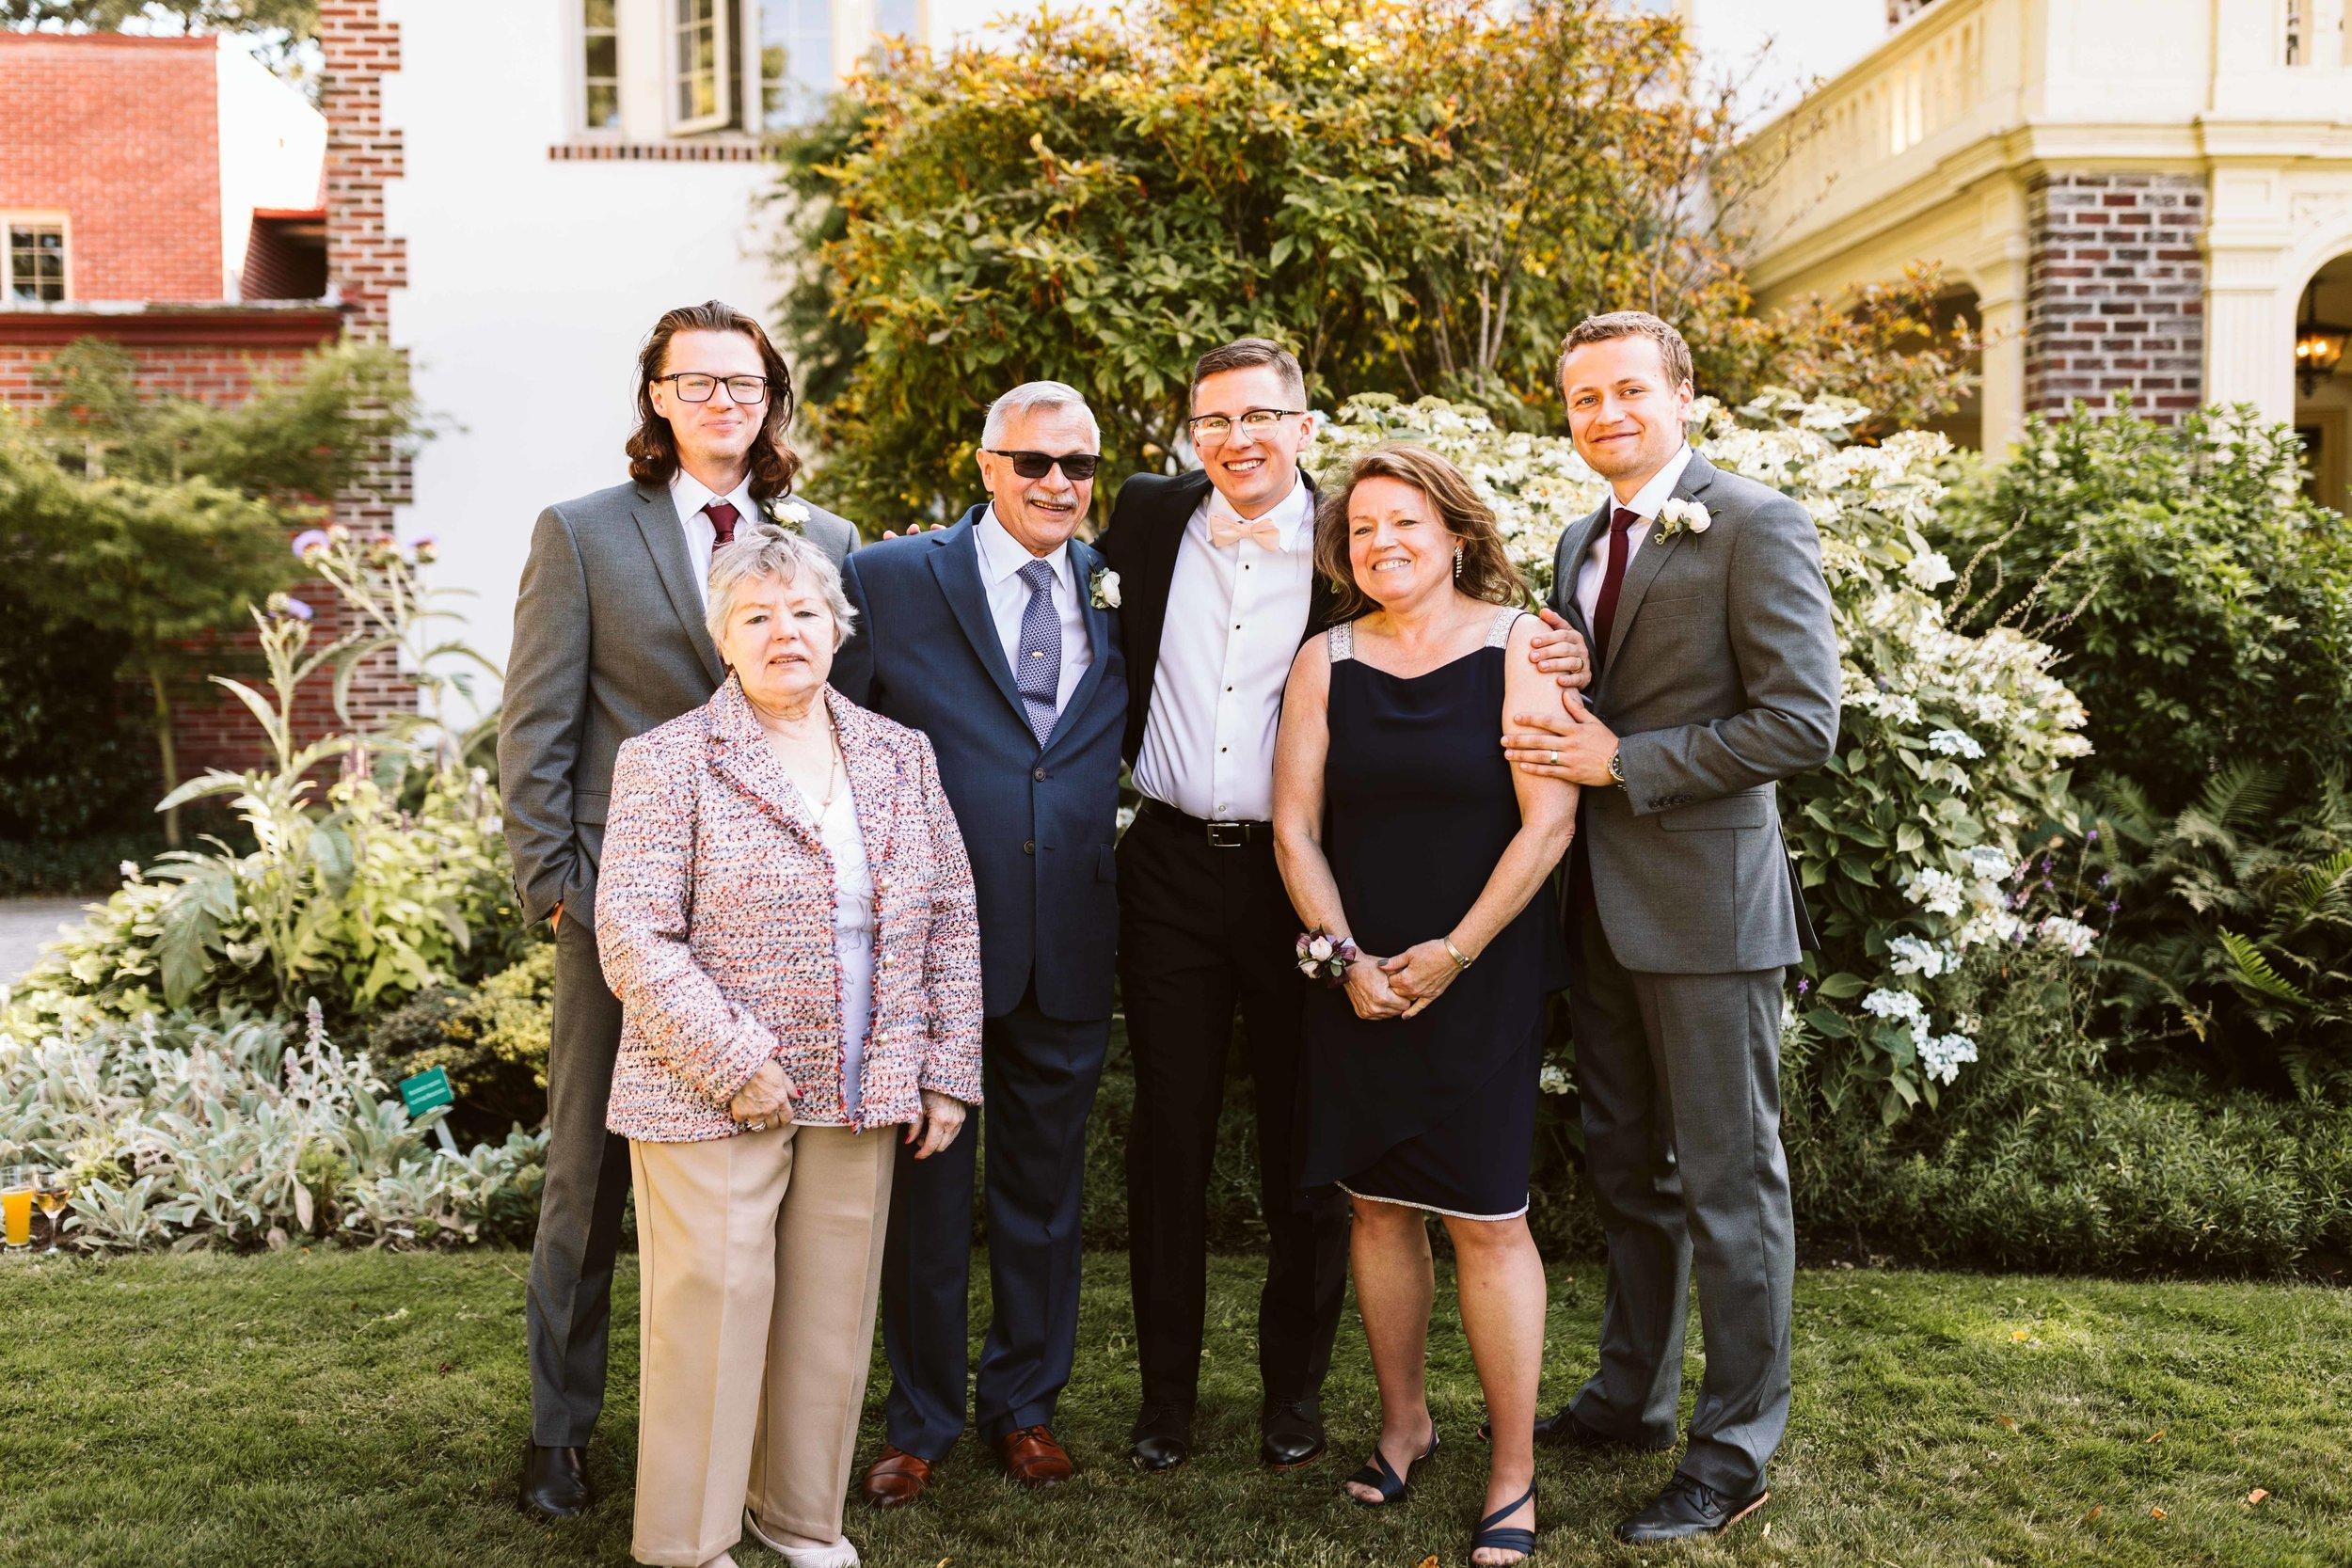 lairmont-manor-wedding-68.jpg